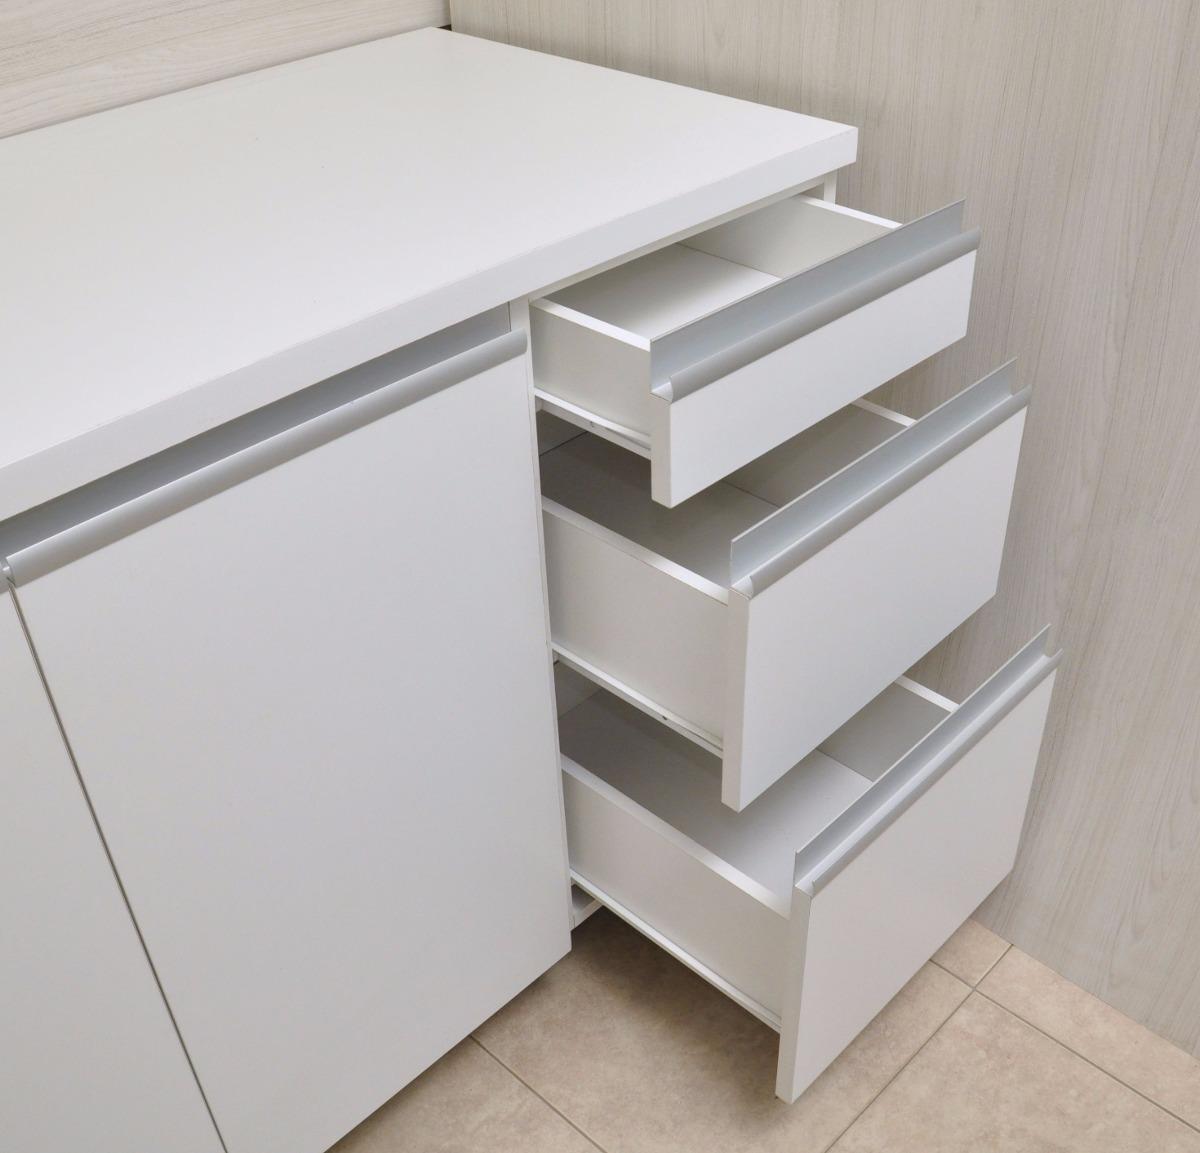 Mueble De Cocina 2 Mts Manijas J Aluminio Melamina - $ 15.821,00 en ...